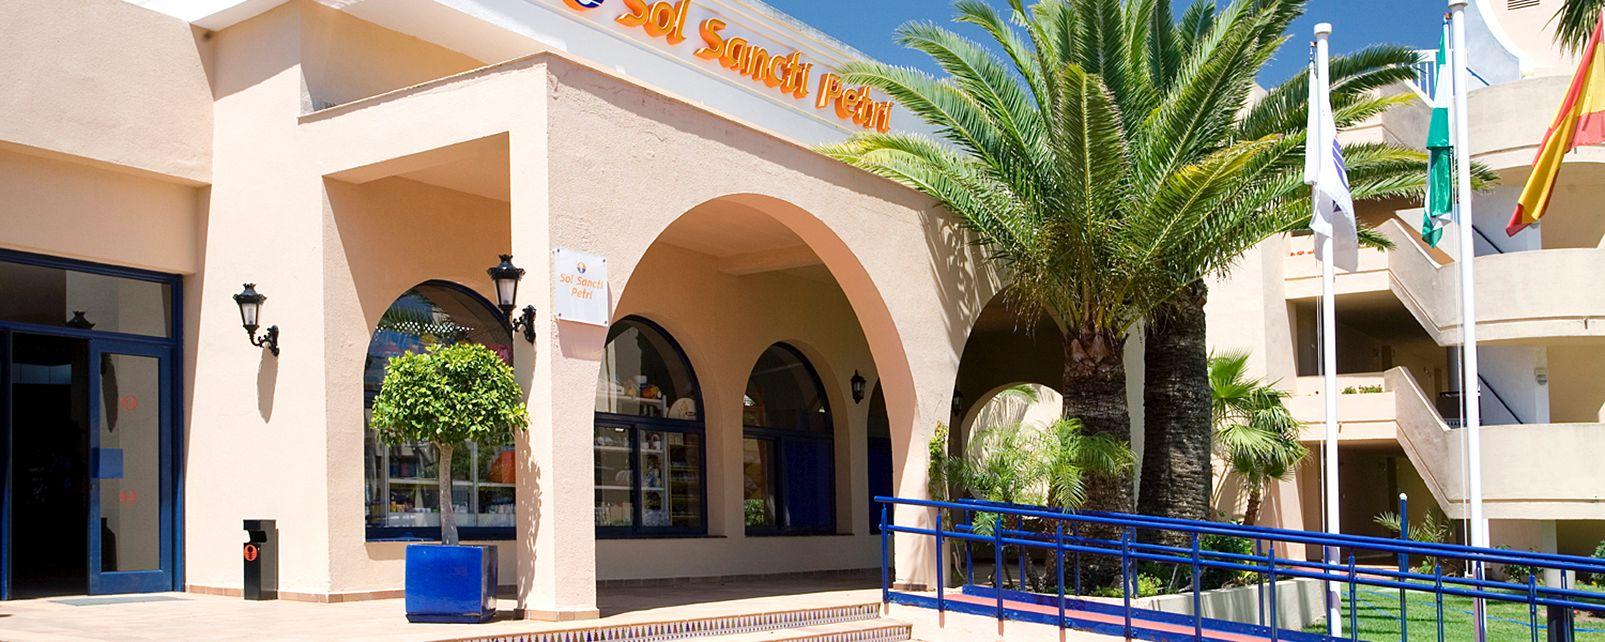 Hôtel Sol Sancti Petri